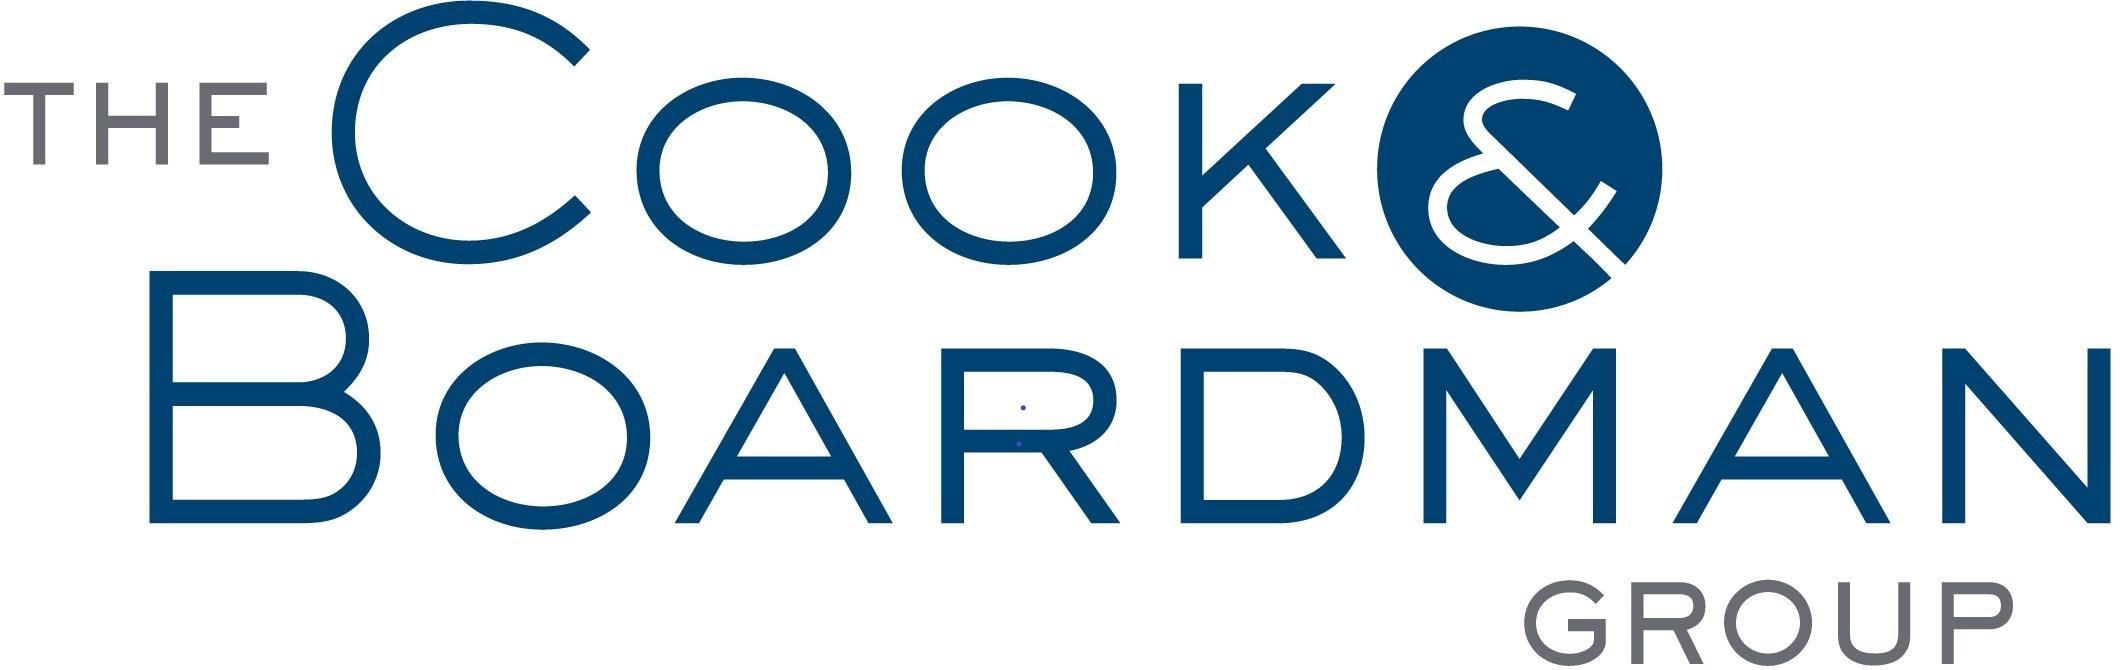 The Cook & Boardman Group logo